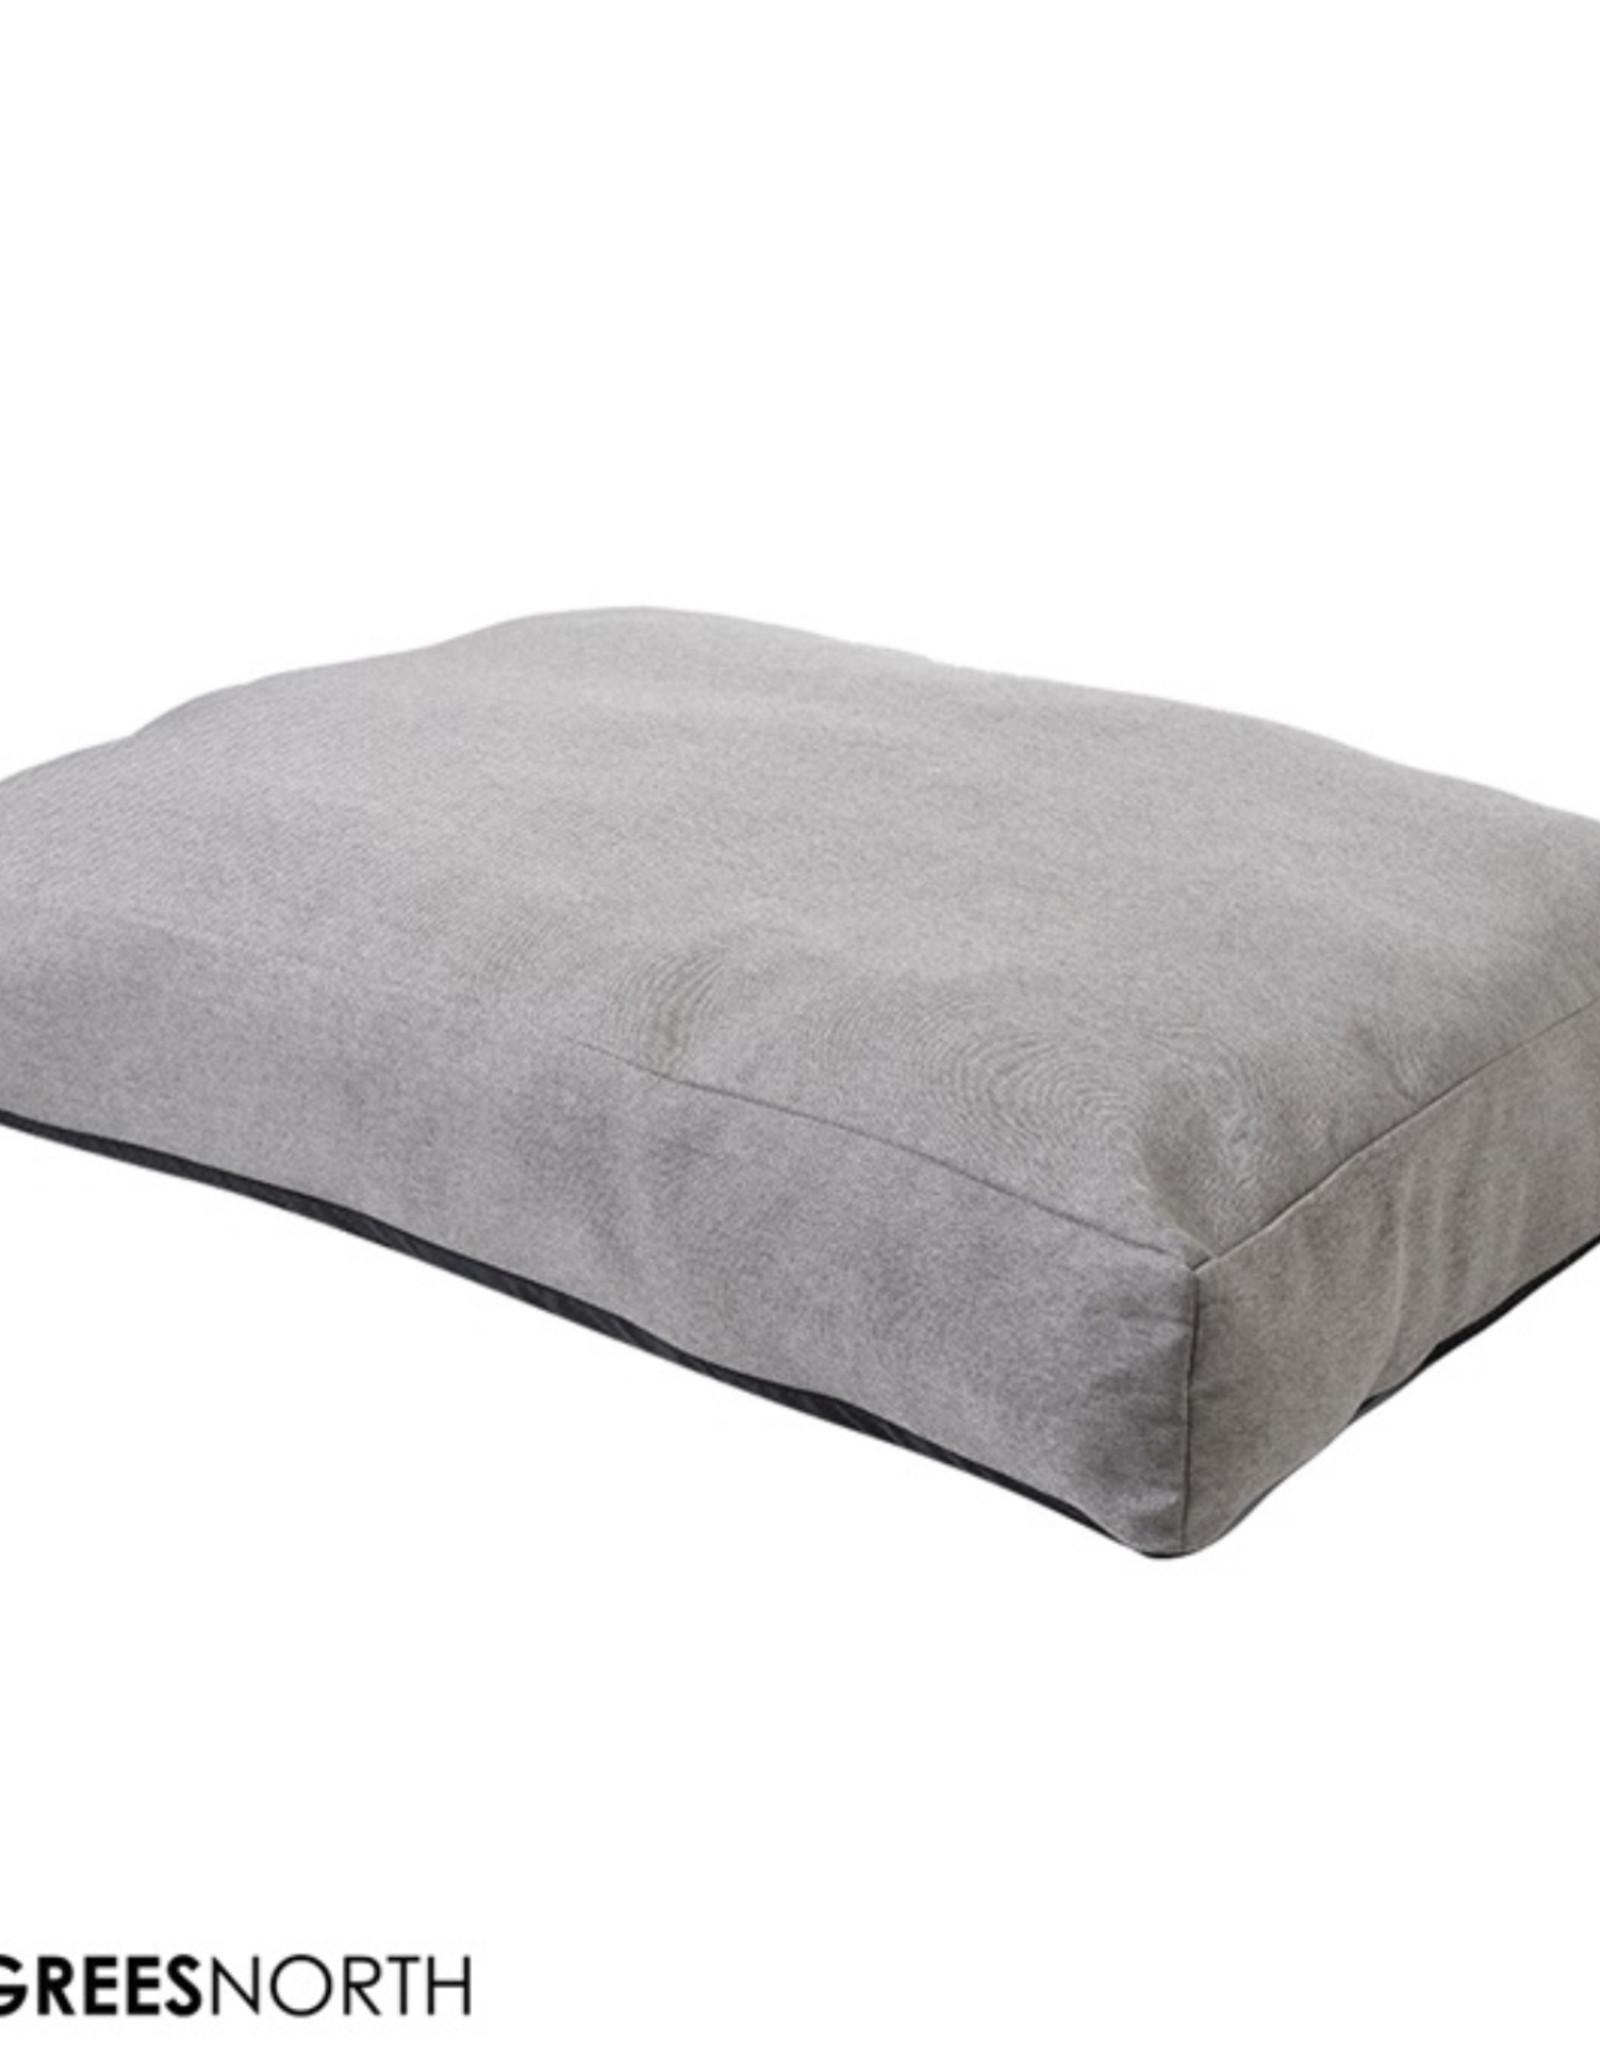 51 Degrees North Orthopedic cotton box pillow